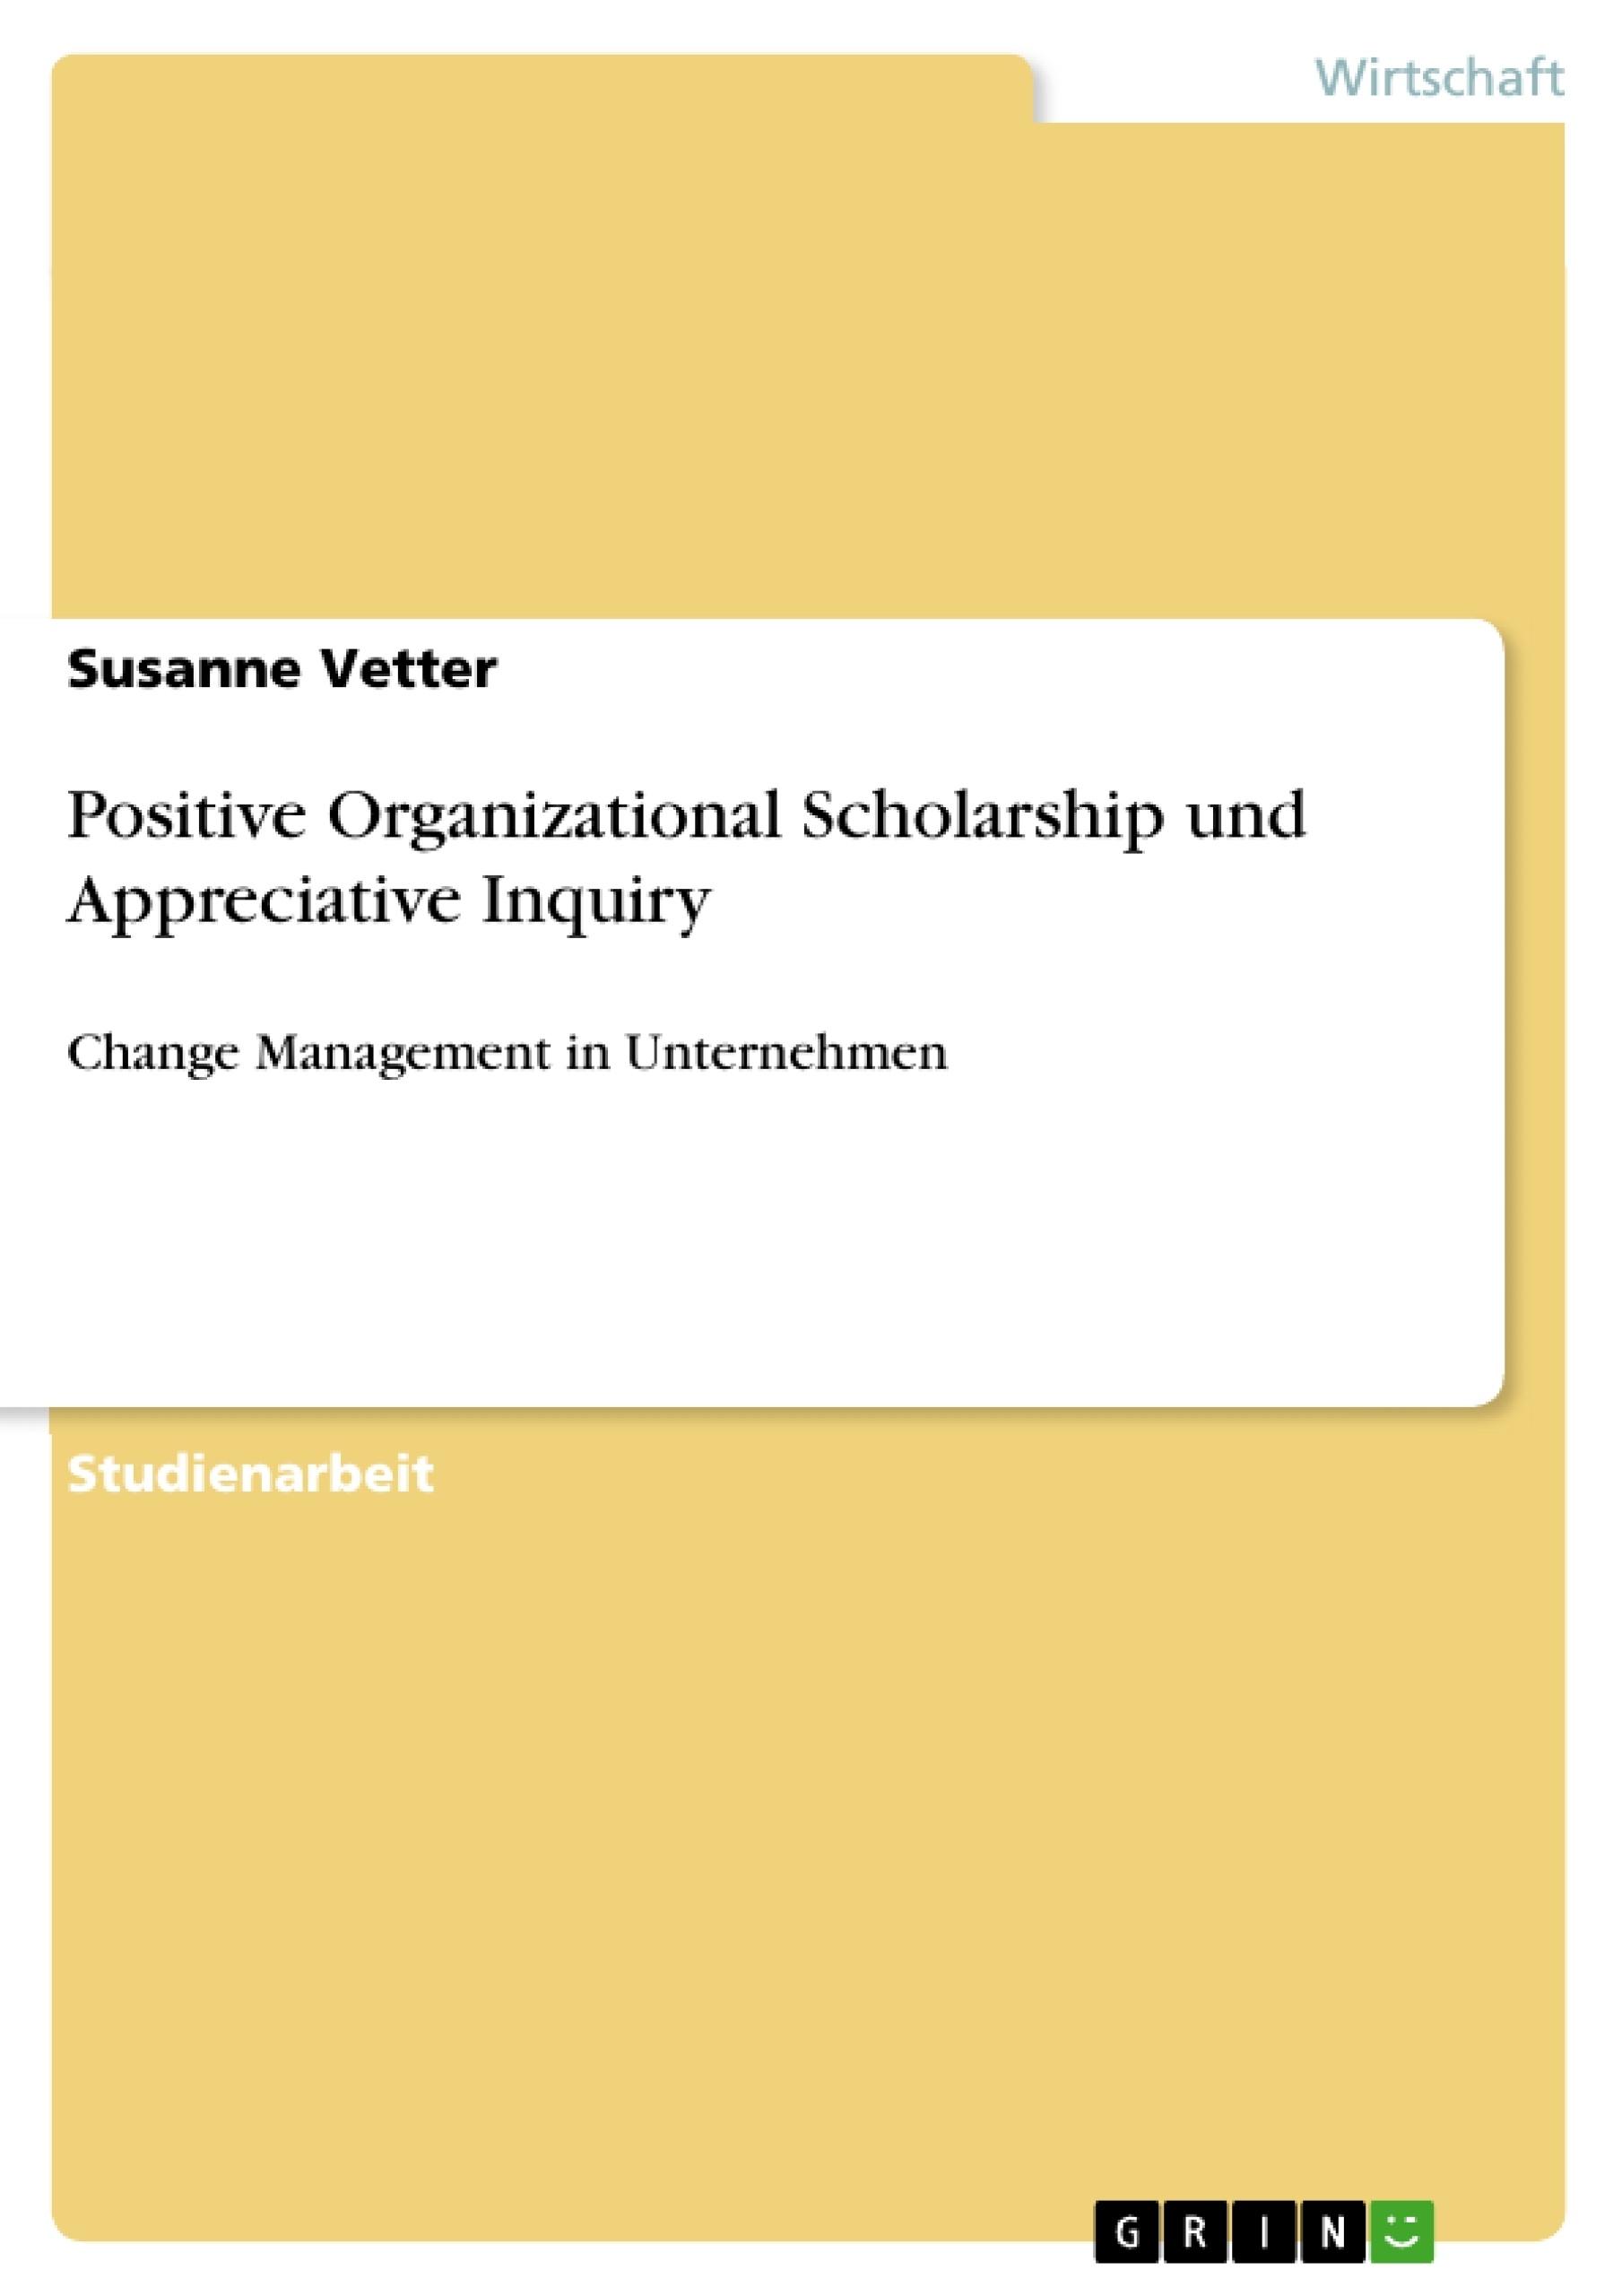 Titel: Positive Organizational Scholarship und Appreciative Inquiry